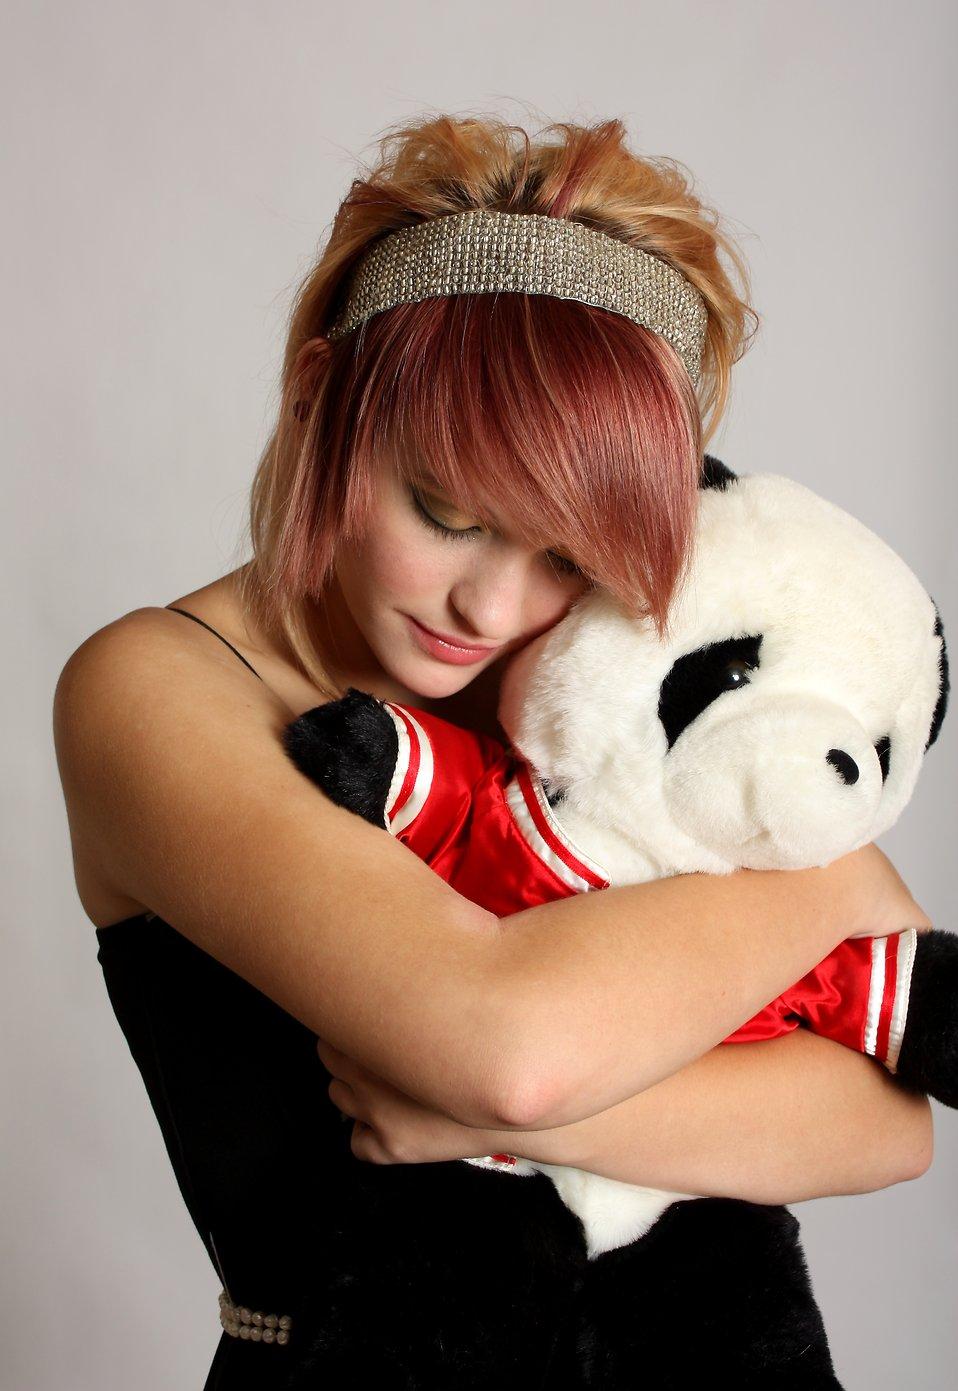 A beautiful young girl holding a stuffed panda bear : Free Stock Photo